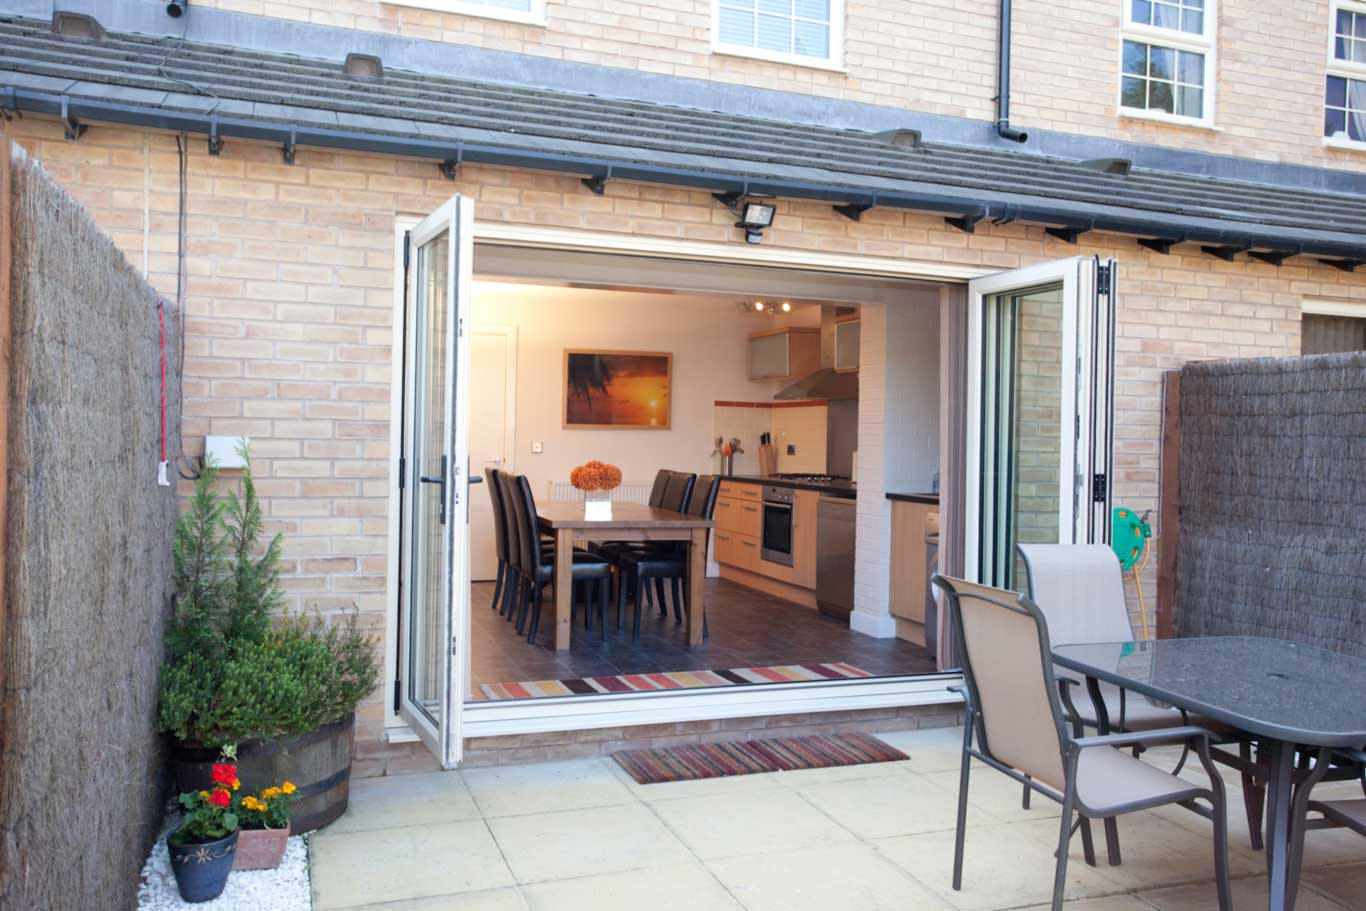 Benefits of Using Bi-Fold Doors